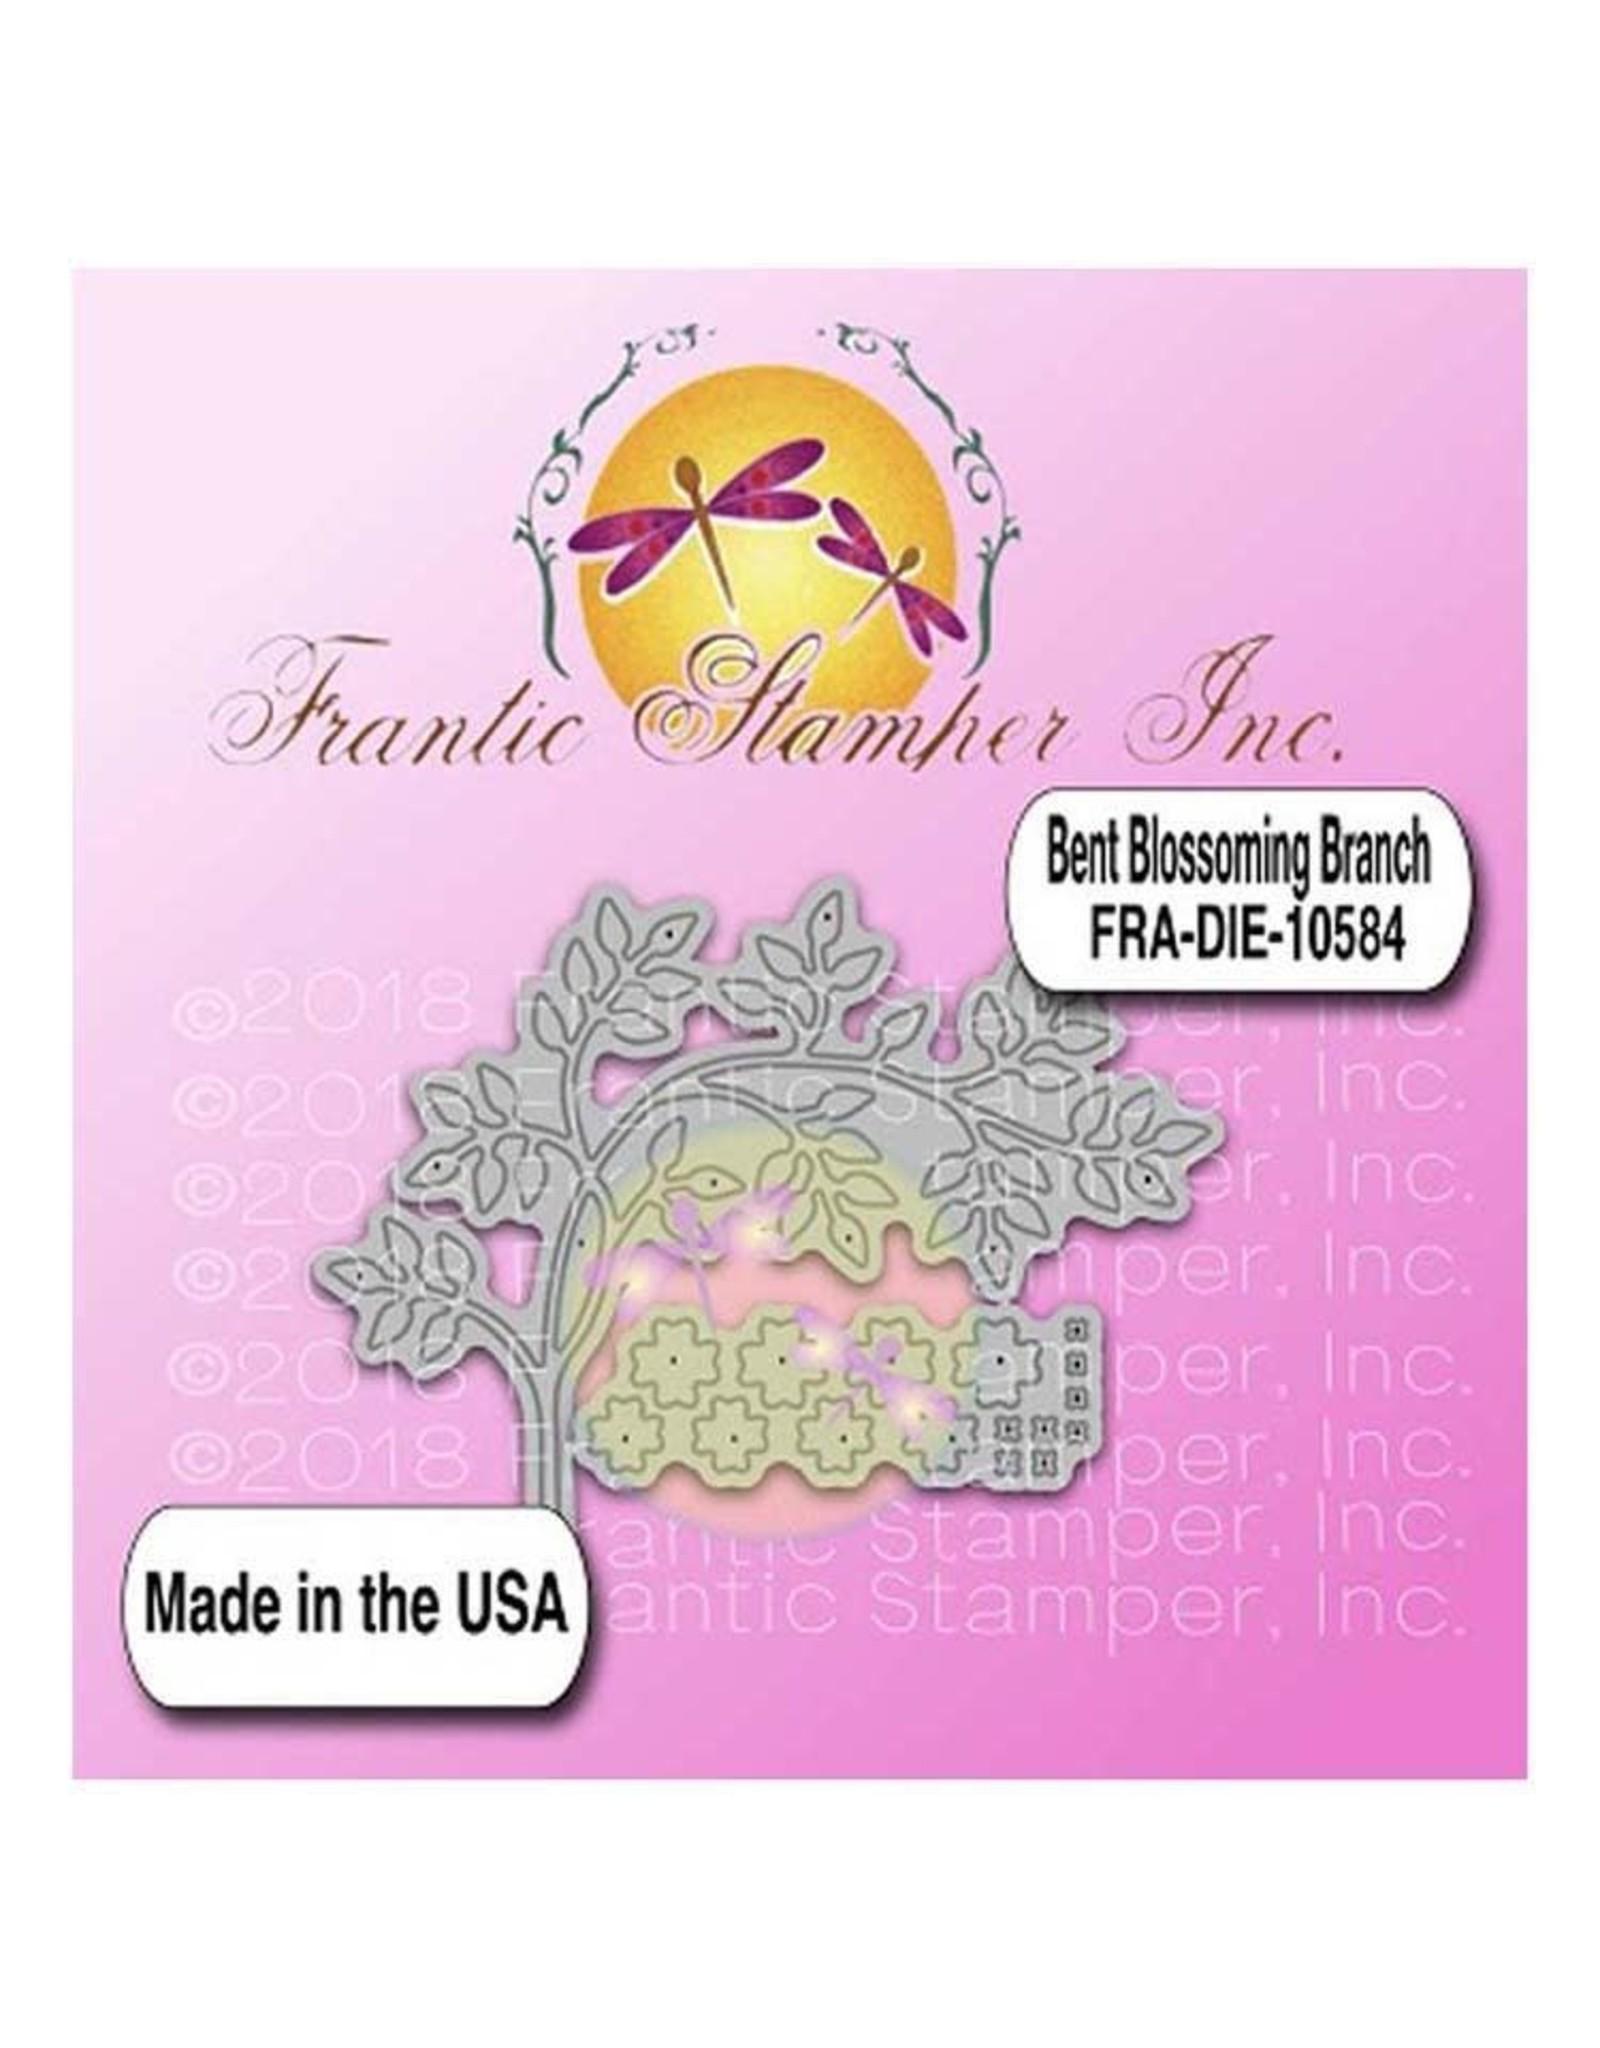 Frantic Stamper Inc Bent Blossoming Branch - Dies